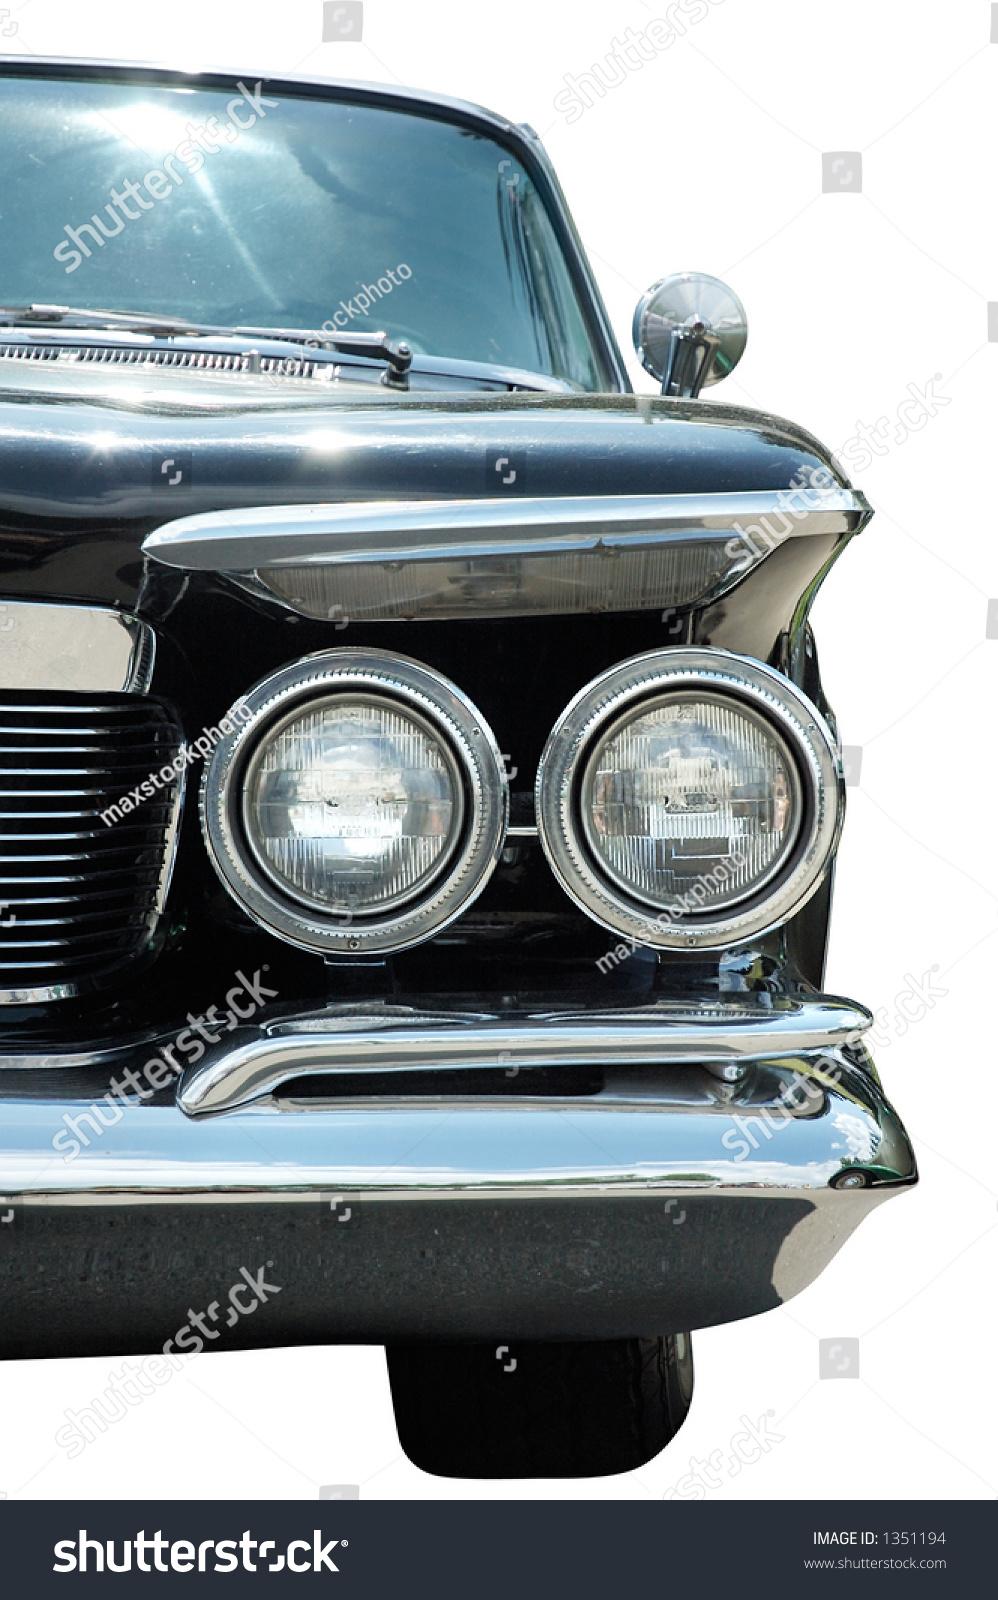 Antique Automobile Headlamps : Old classic black vintage car headlights stock photo